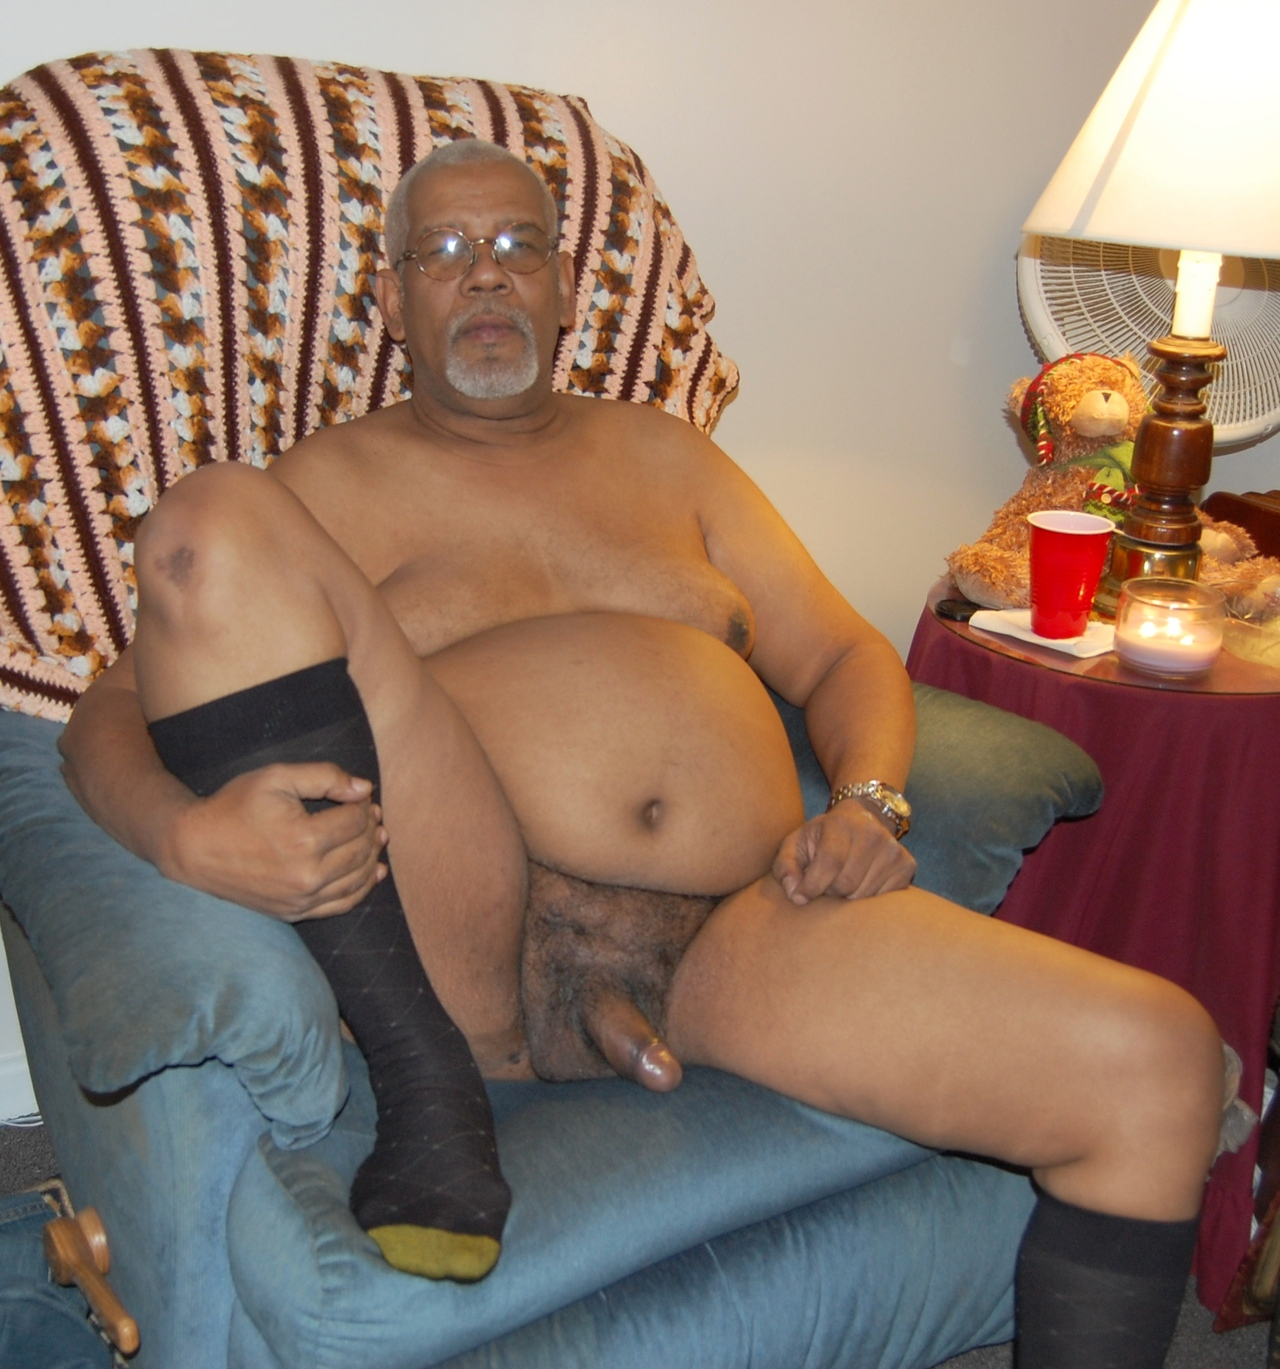 Naked Chubby Black Men Dicks Chocolate Chub Bear Gay